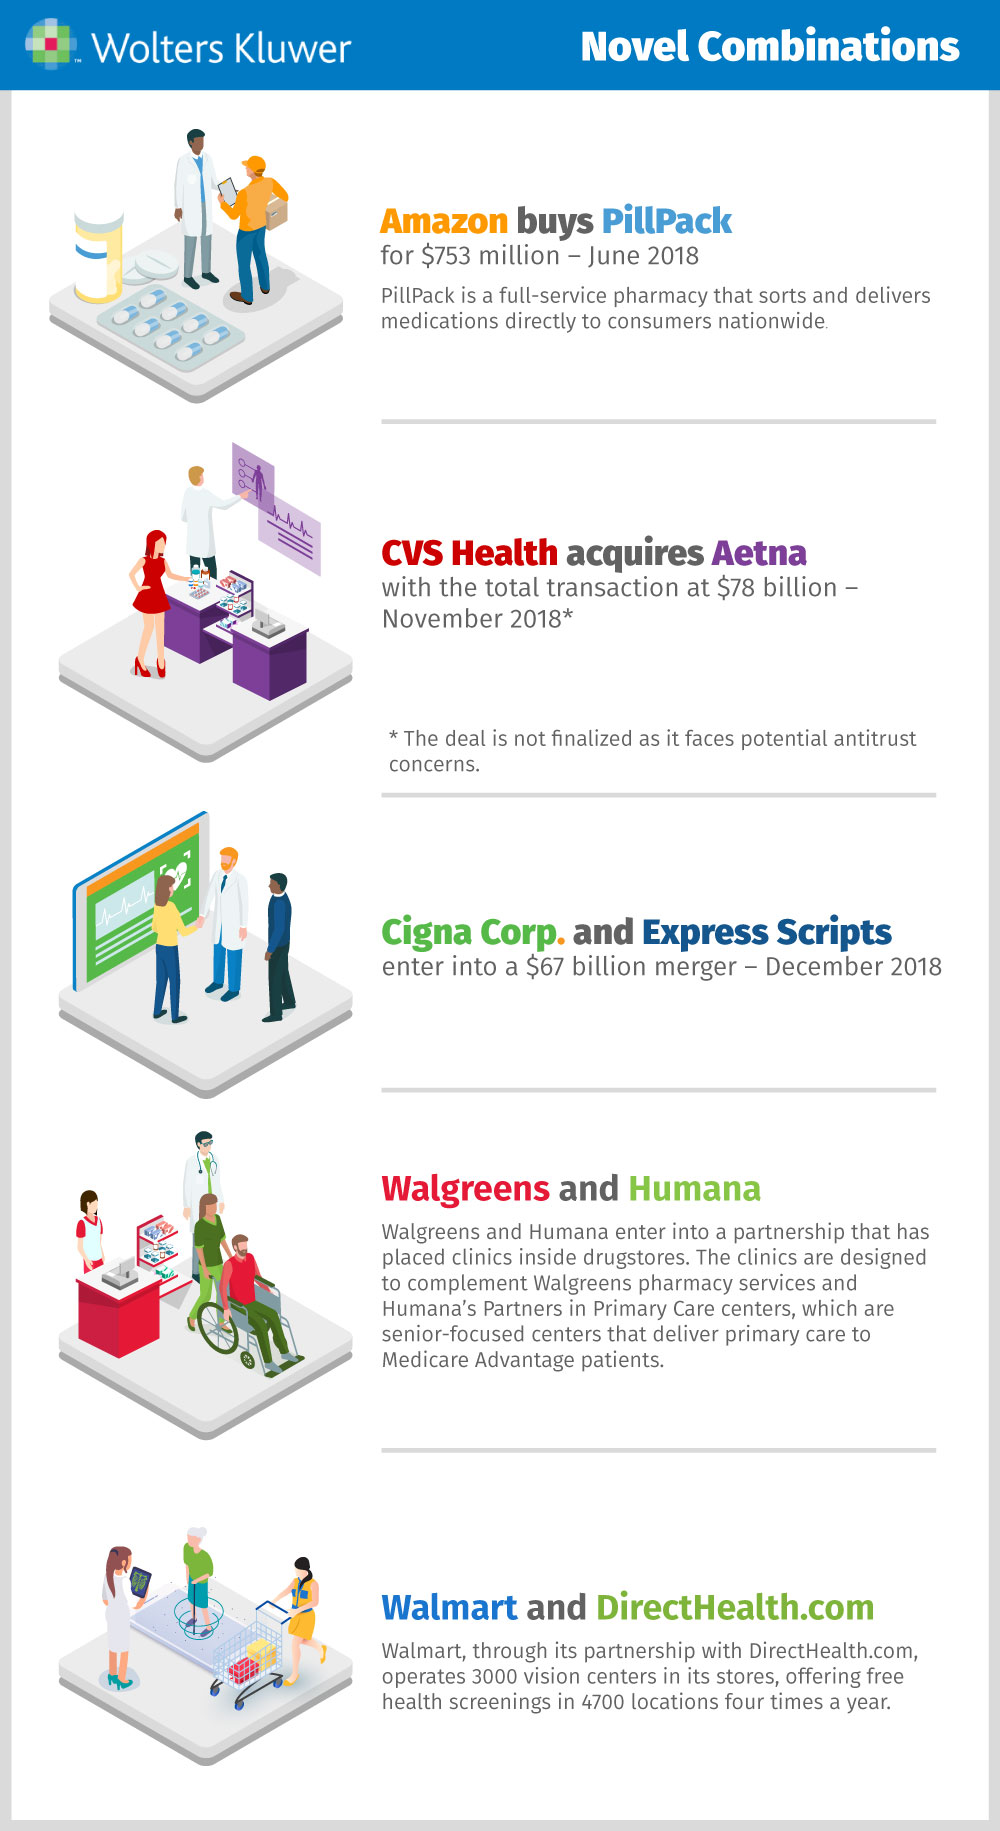 Novel Healthcare Combinations